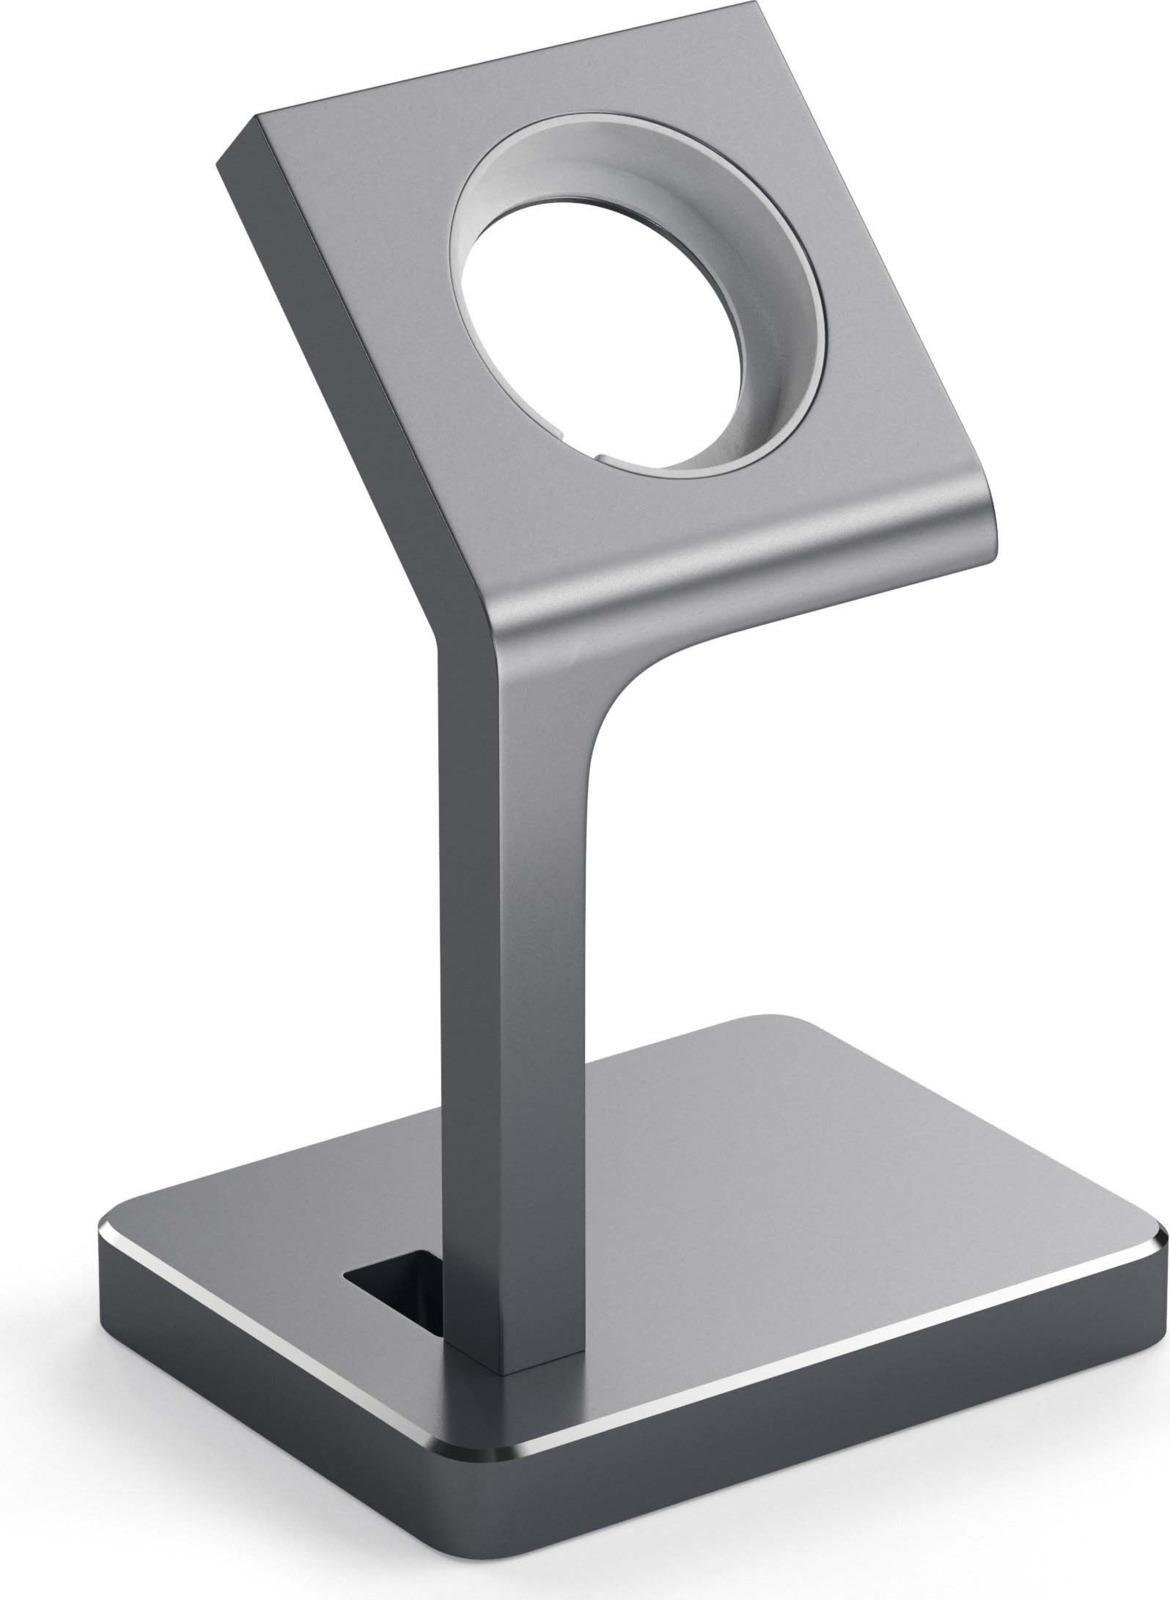 Док-станция Satechi Aluminum Apple Watch Charging Stand для Apple Watch, ST-AWSM, серый satechi aluminum wireless grey st ahpm